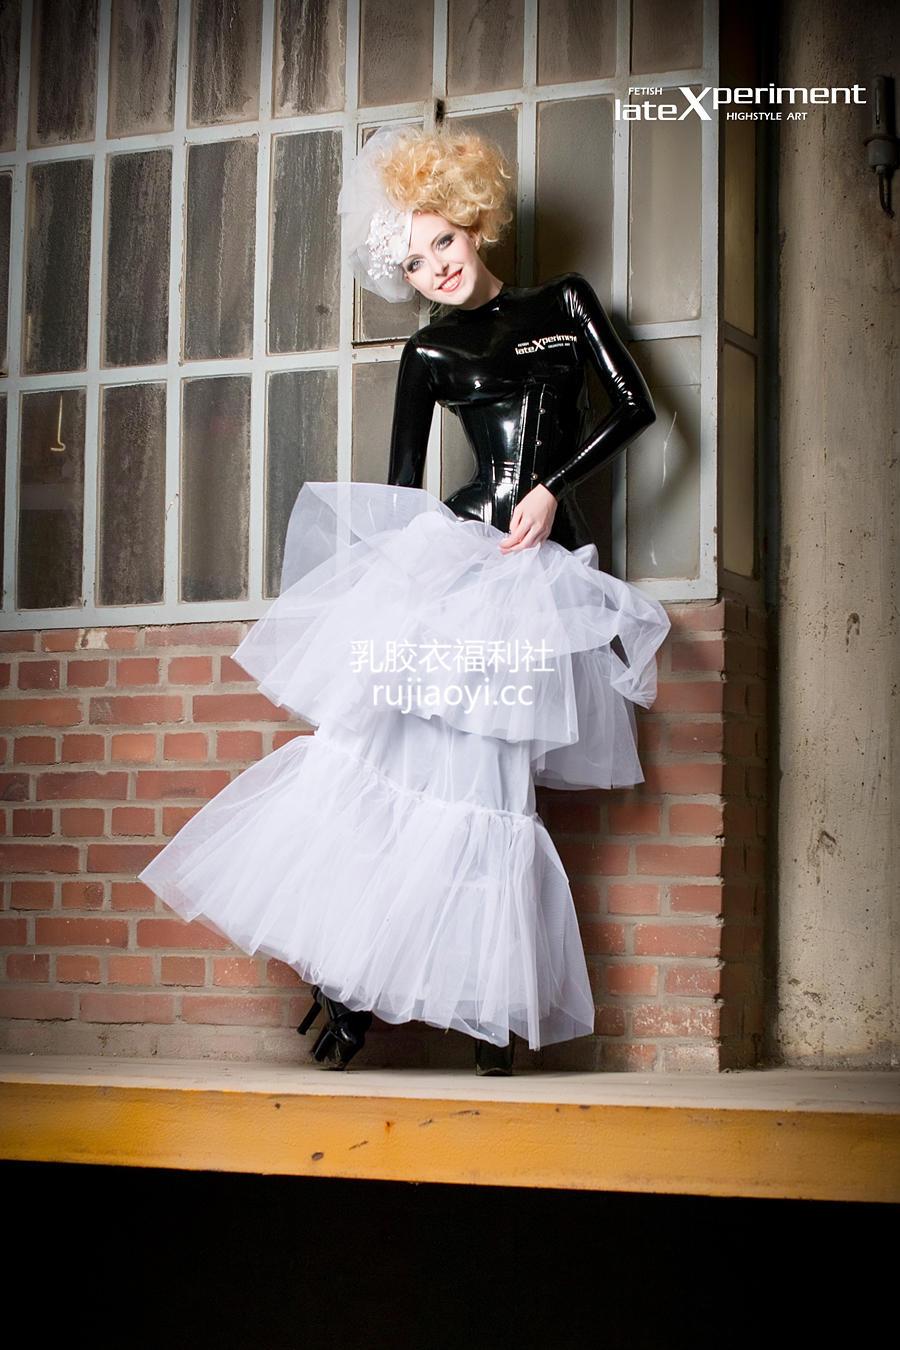 [LateXperiment] 身穿乳胶衣的外国新娘外拍写真